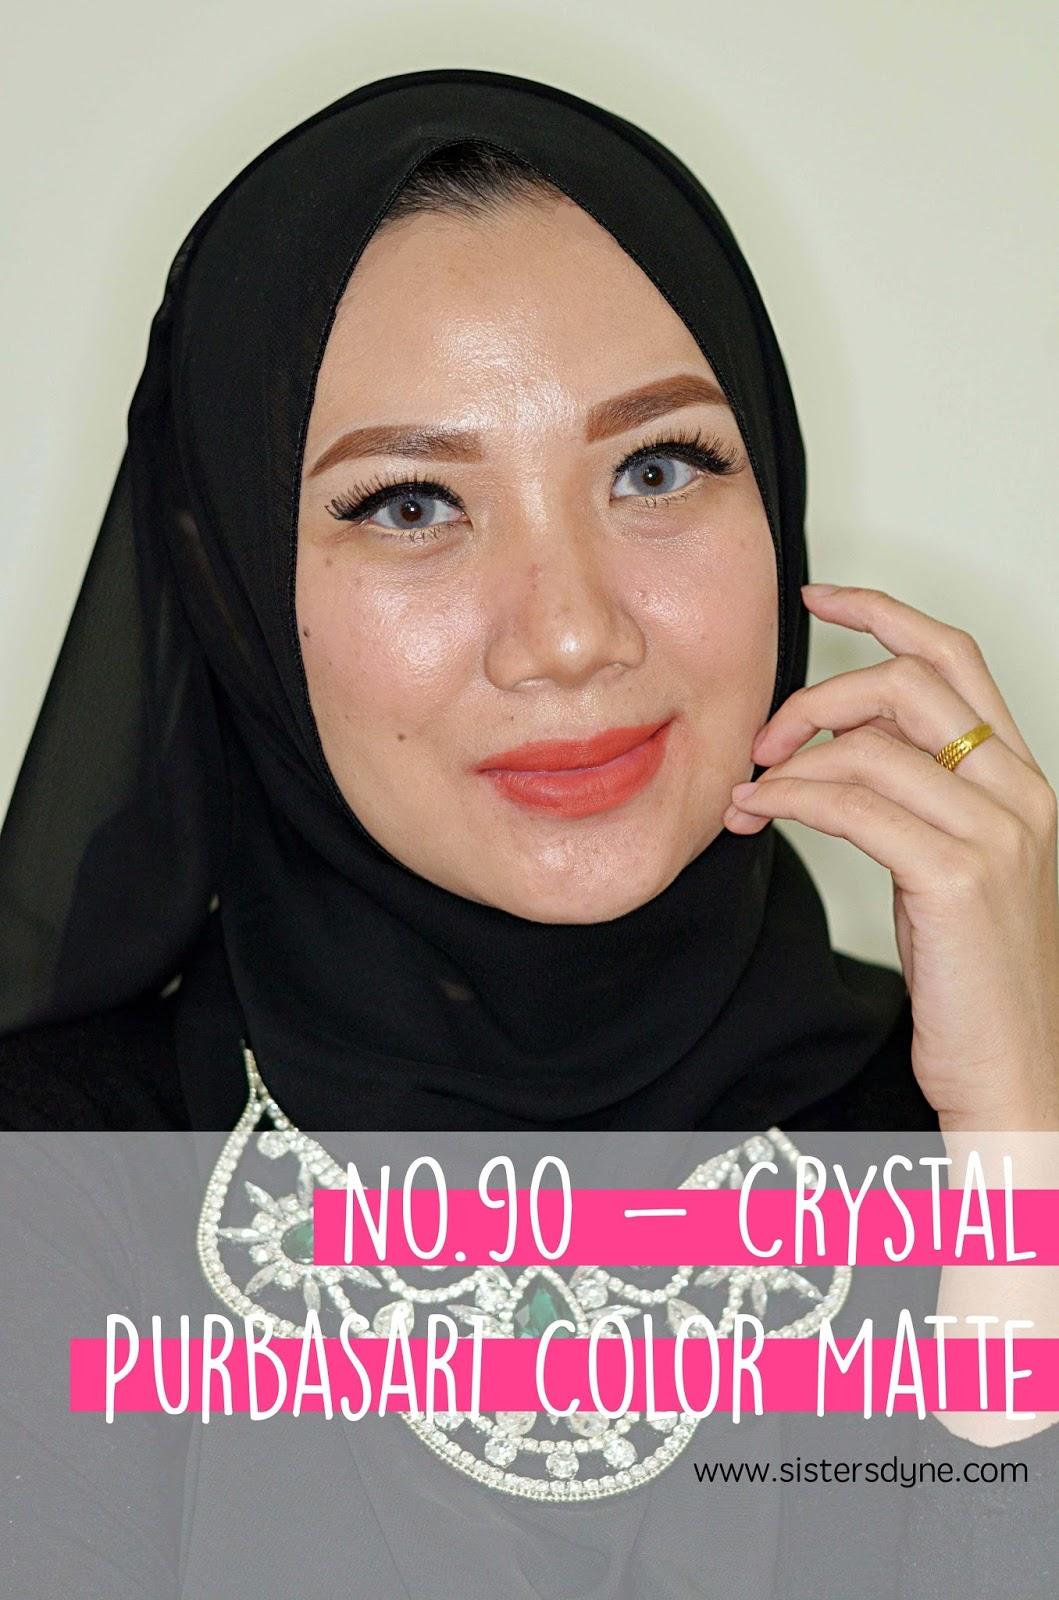 Purbasari Lipstick Matte 90 Crystal Color Da Sisters Blog Review Swatch